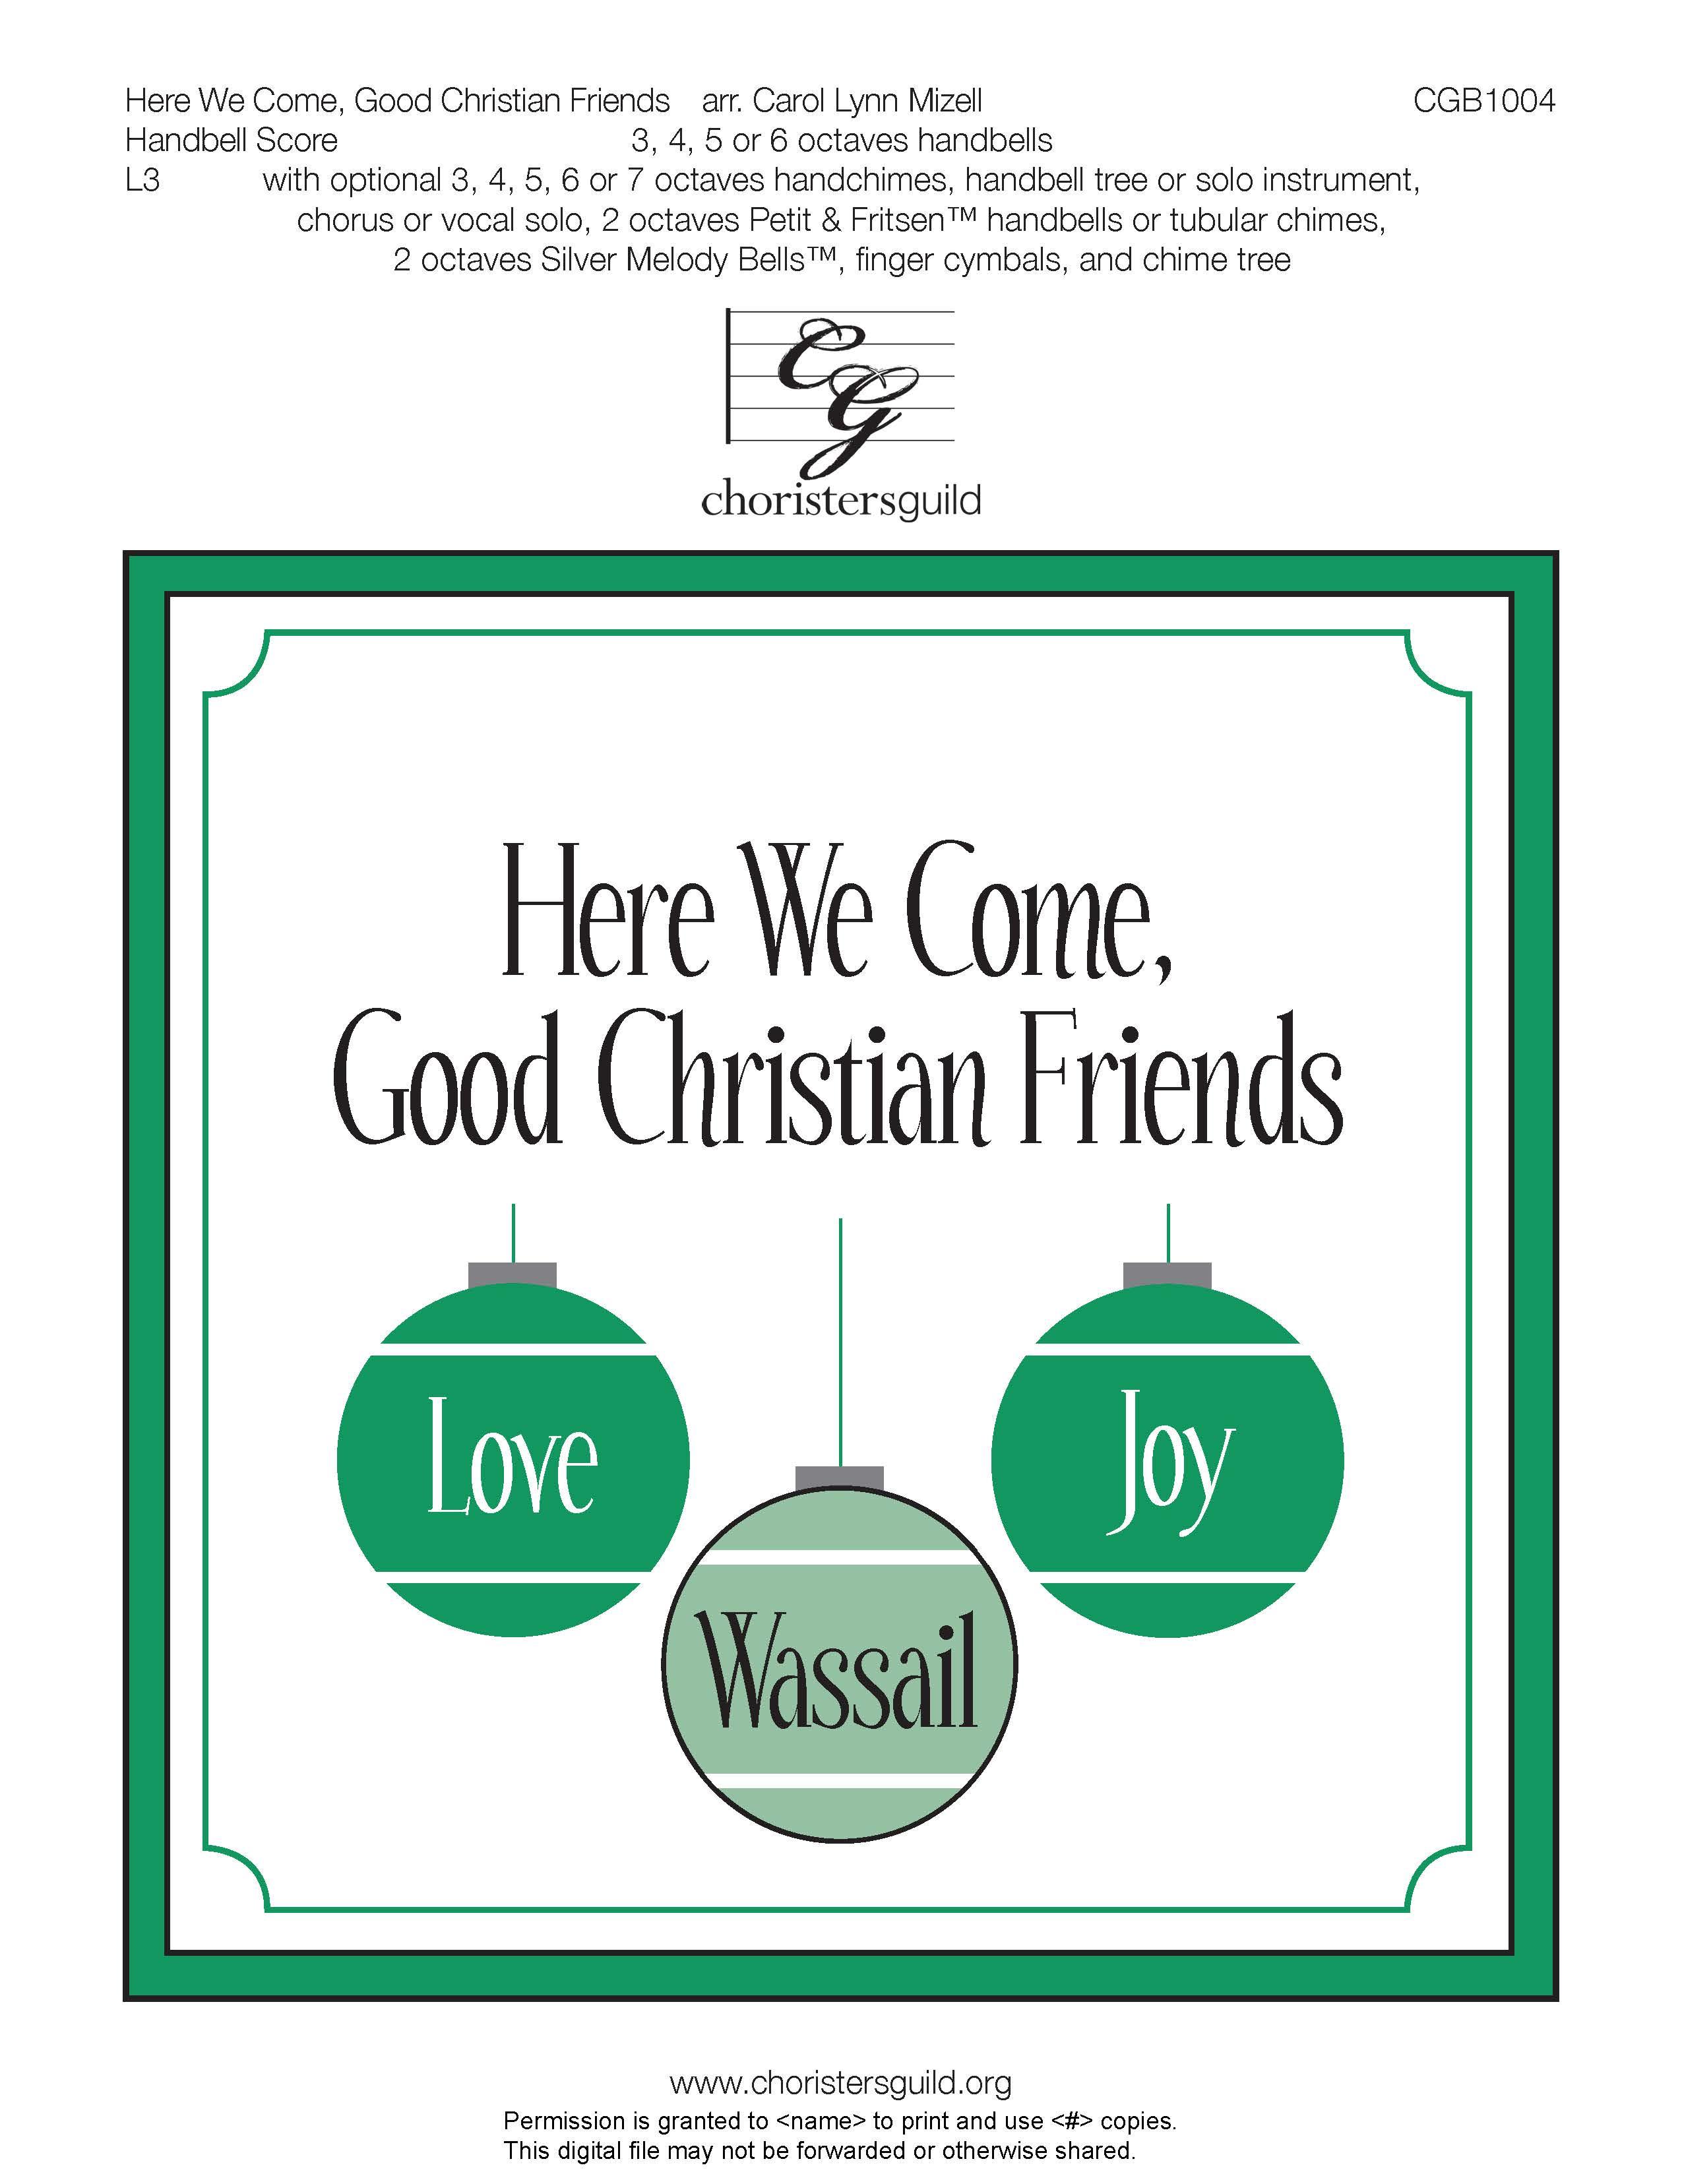 Here We Come, Good Christian Friends - (Digital) Handbell Score